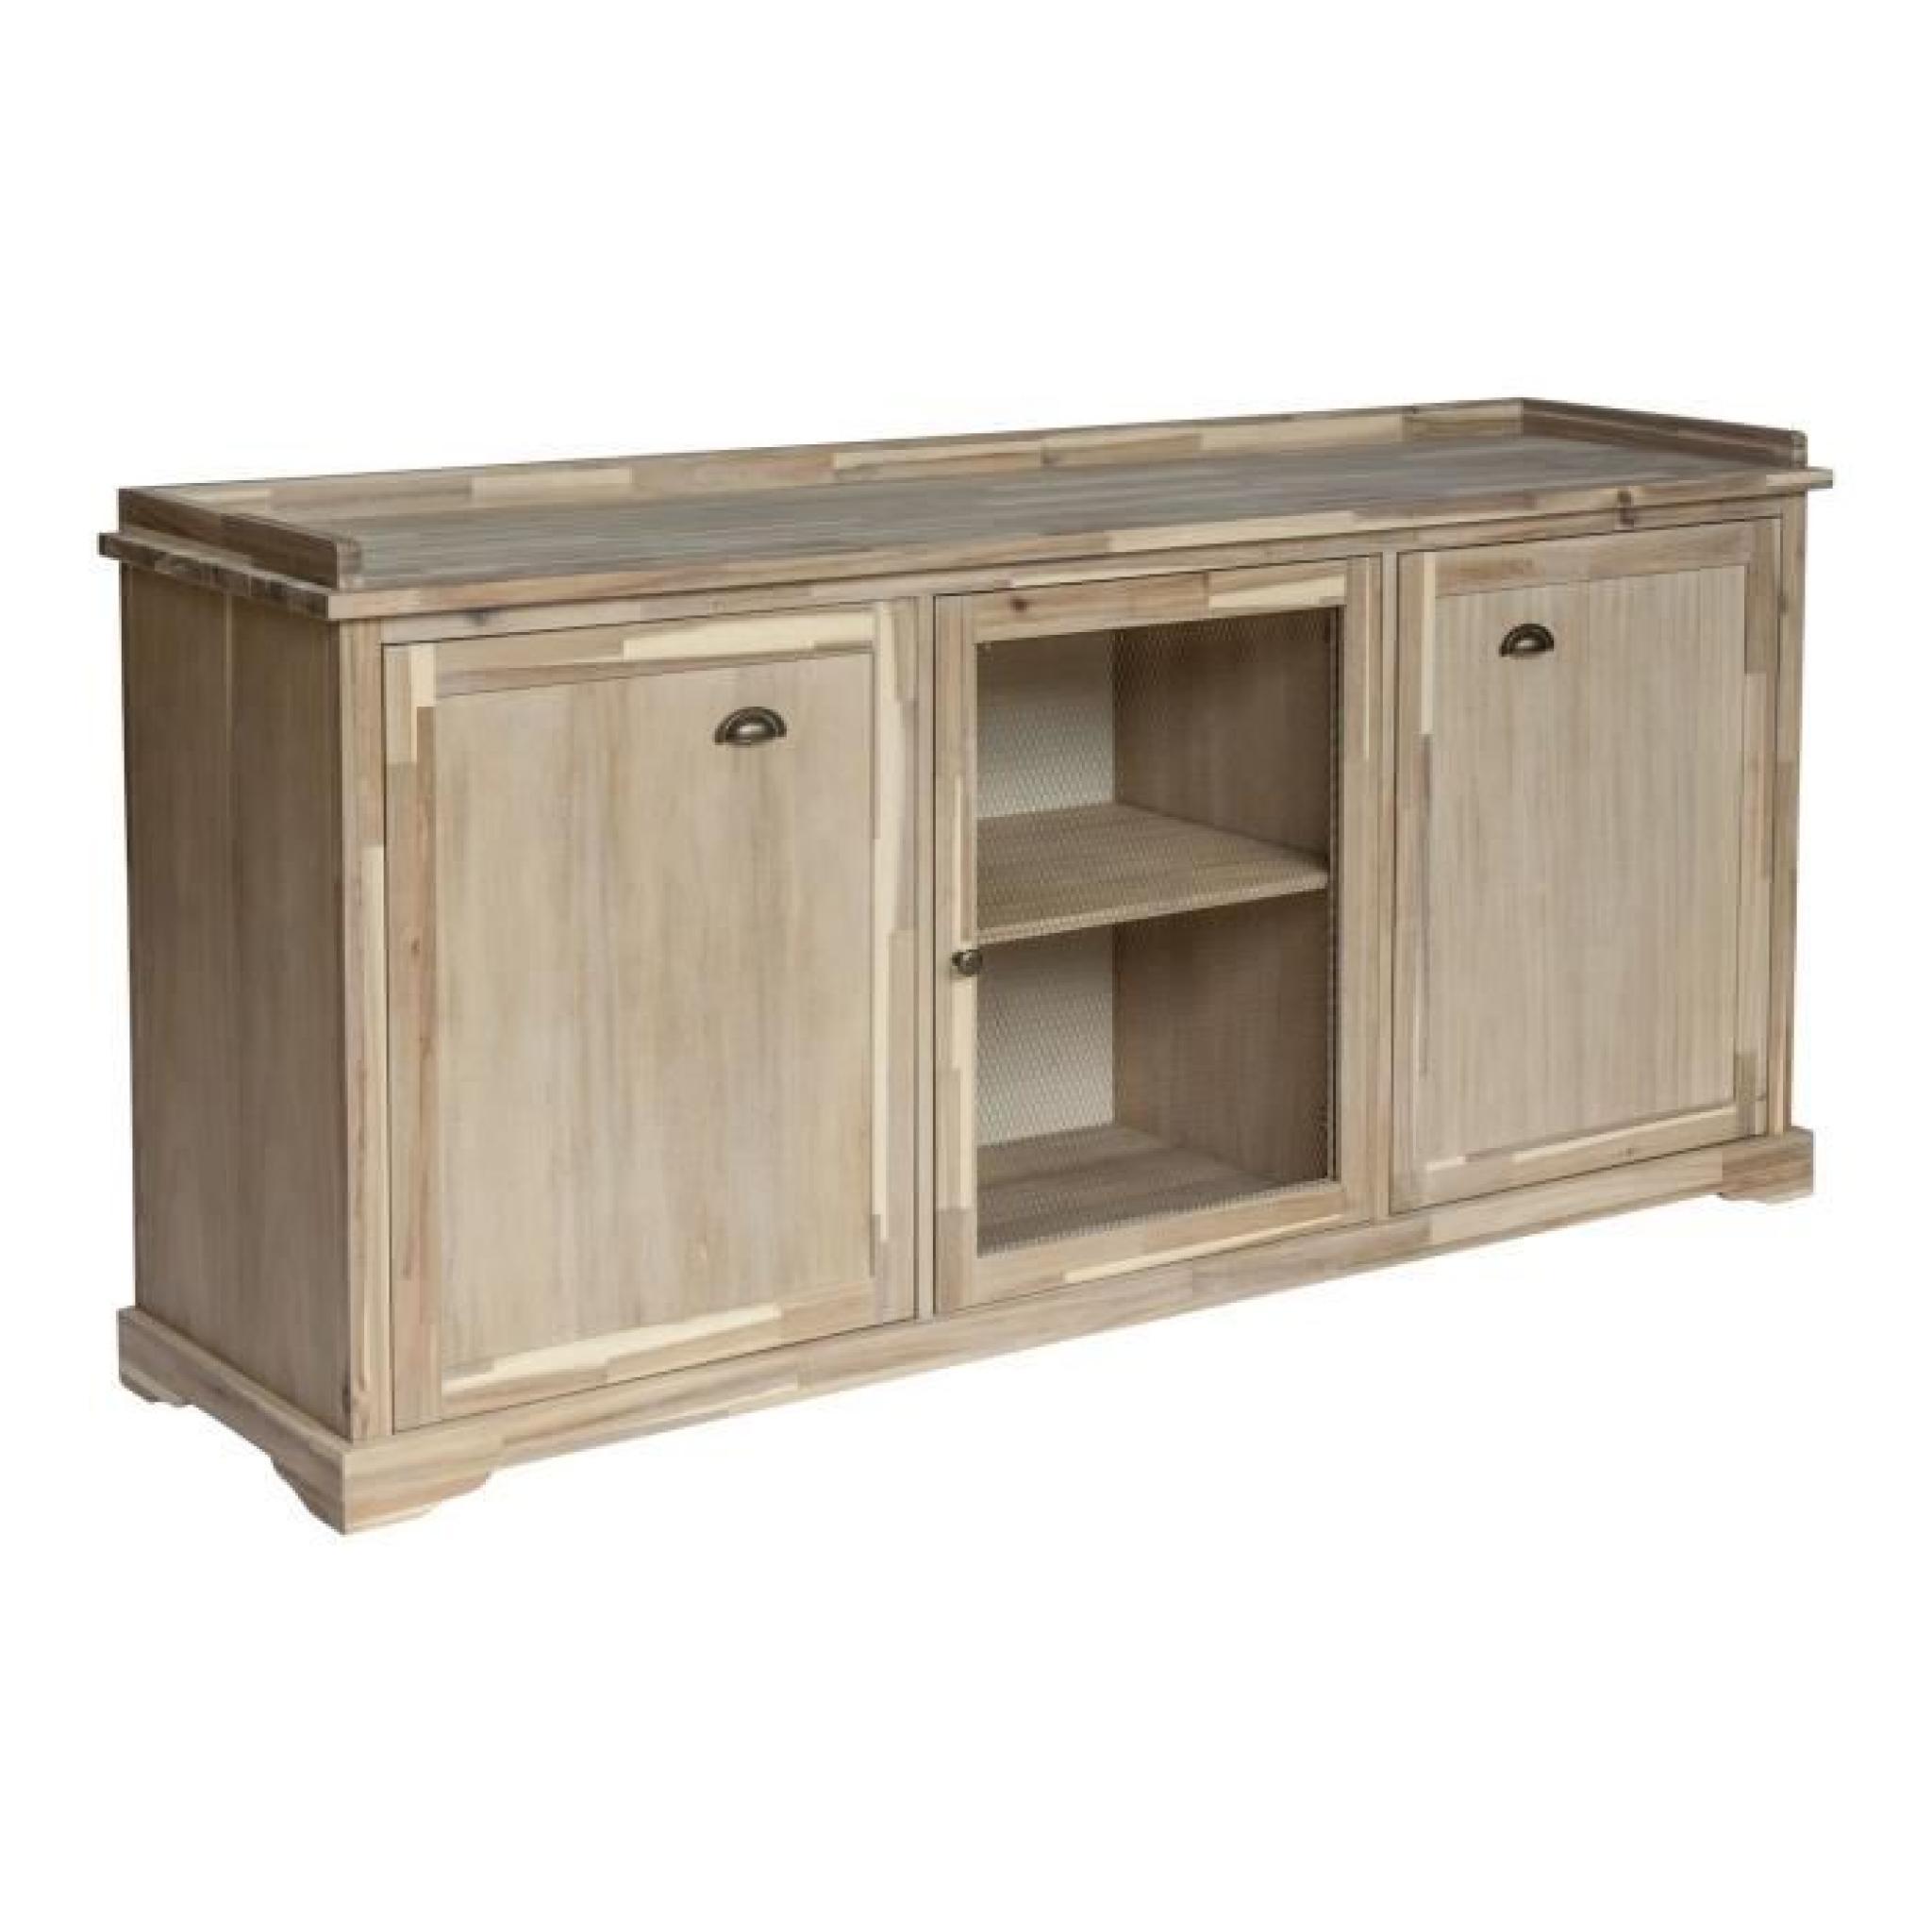 gaston meuble buffet bas en acacia massif avec porte grillag e achat vente buffet pas cher. Black Bedroom Furniture Sets. Home Design Ideas